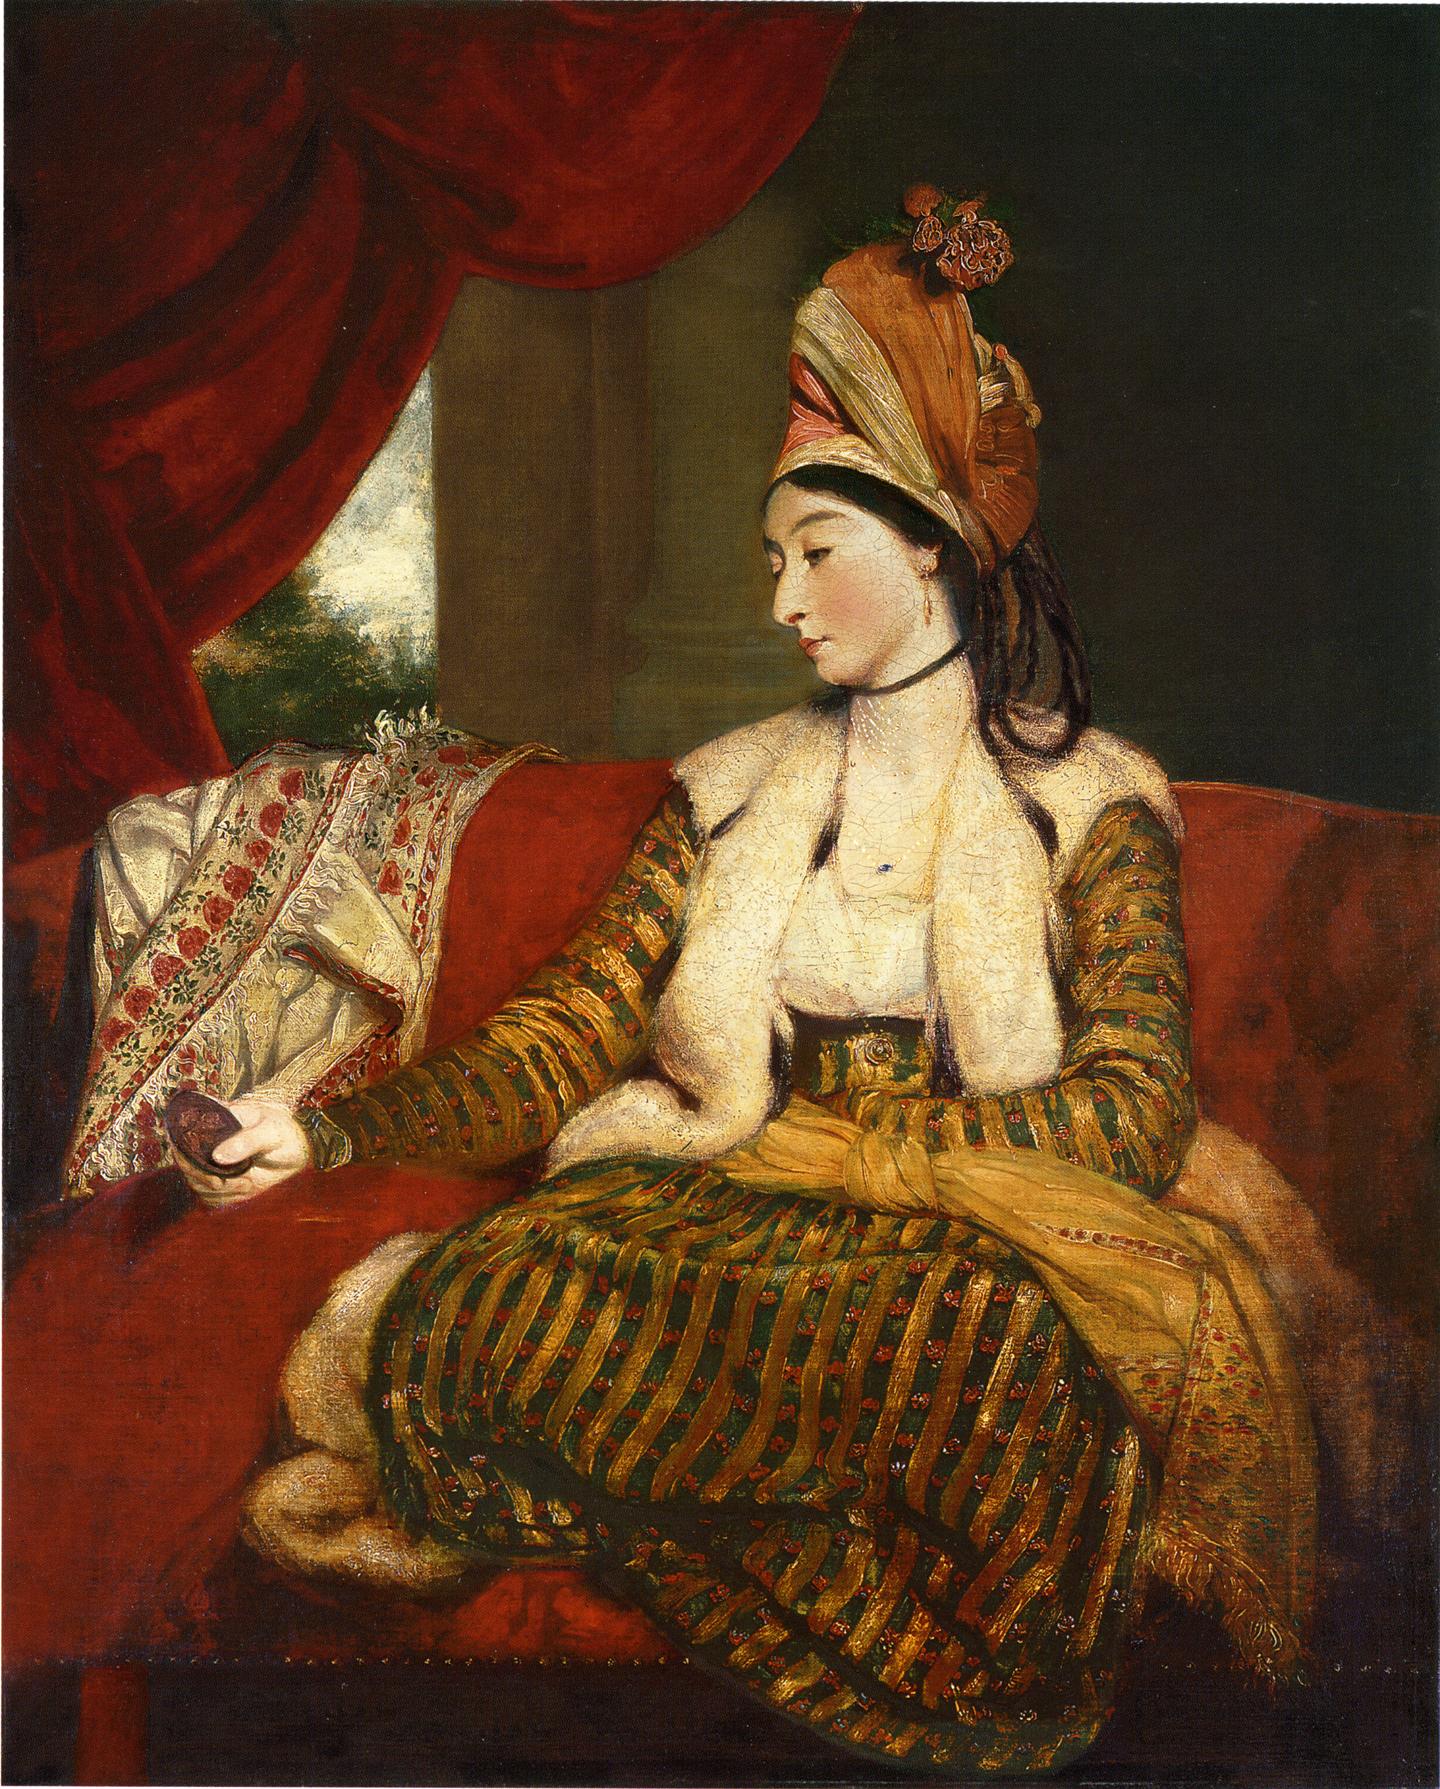 Portrait of Mrs. Baldwin, full length, seated on a red divan :: Joshua Reynolds - 4 women's portraits 18th century hall ôîòî